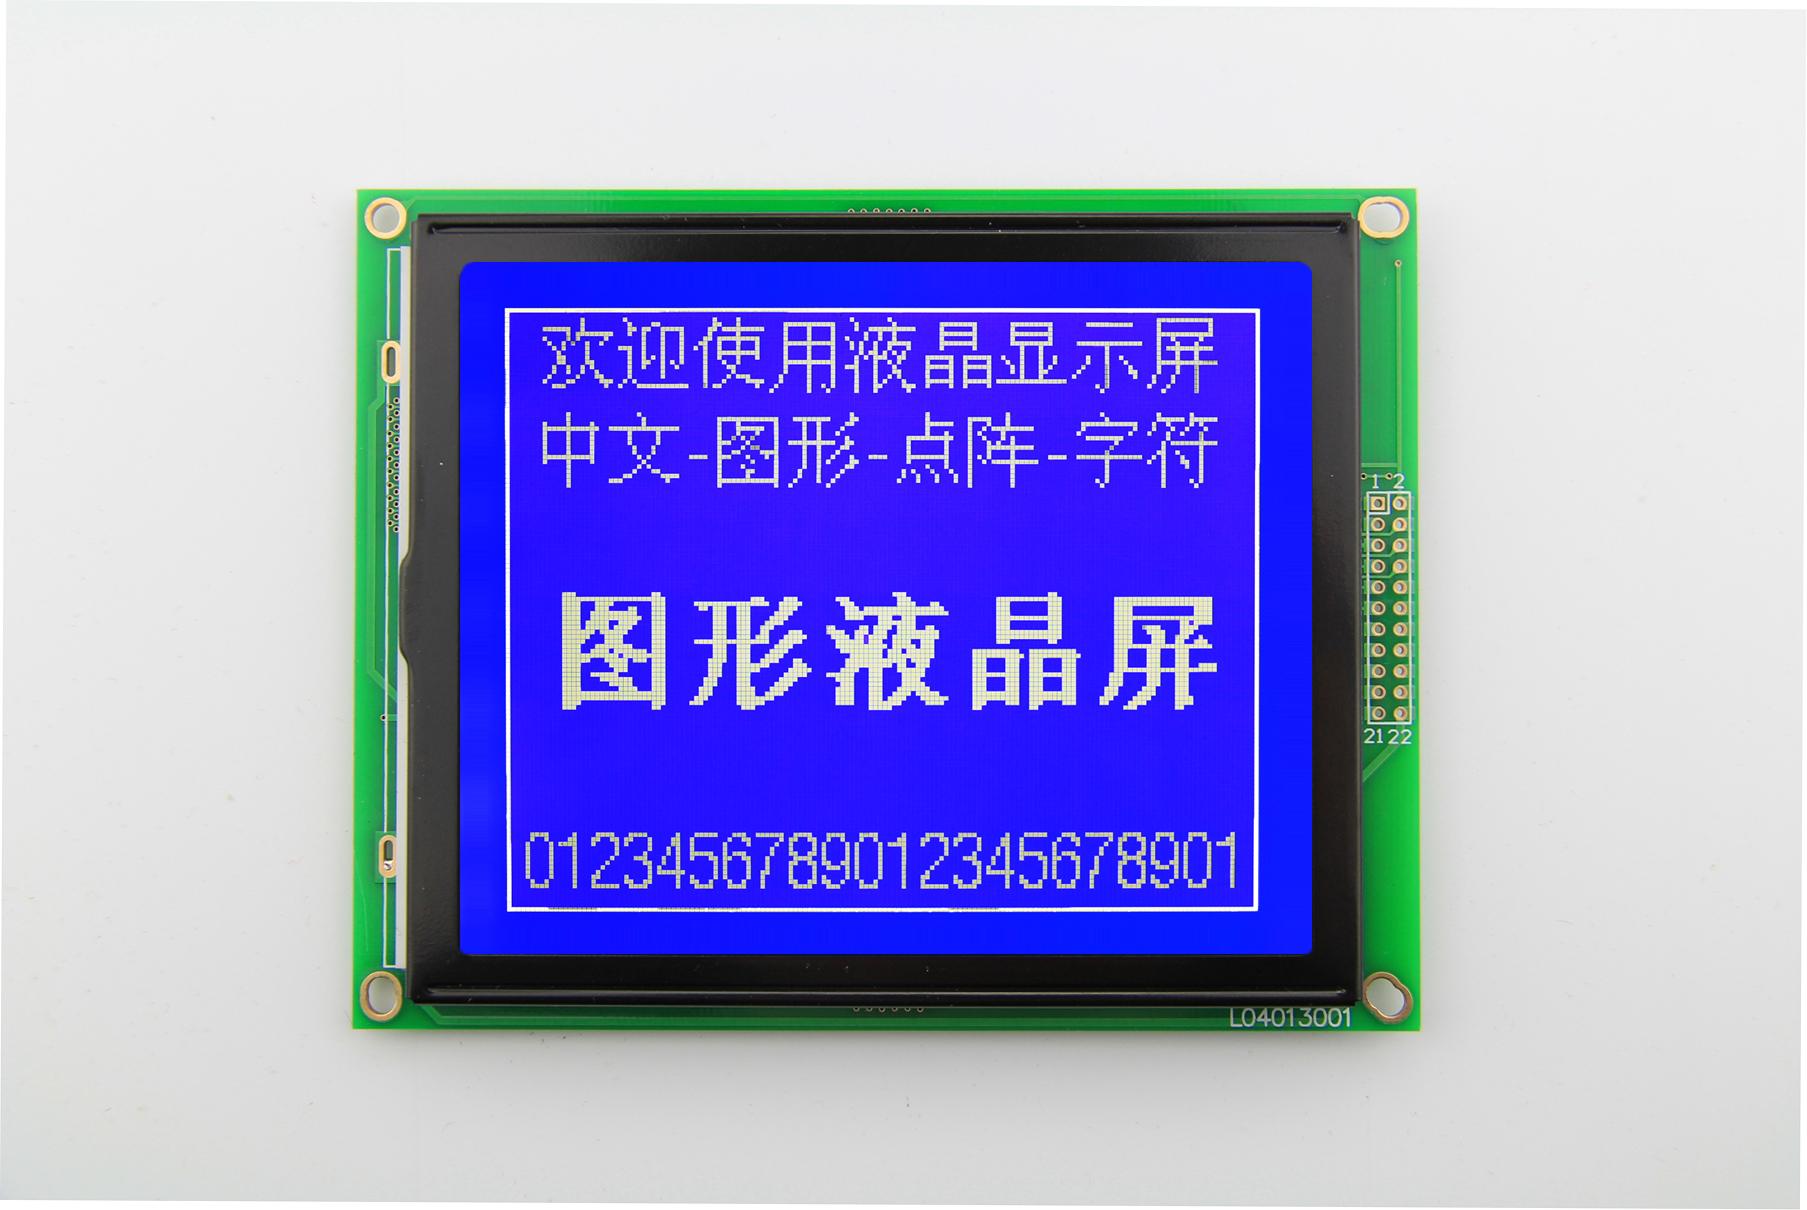 HTM160128B(蓝膜/负显)--标准的显示八行每行十个汉字的图形点阵模组